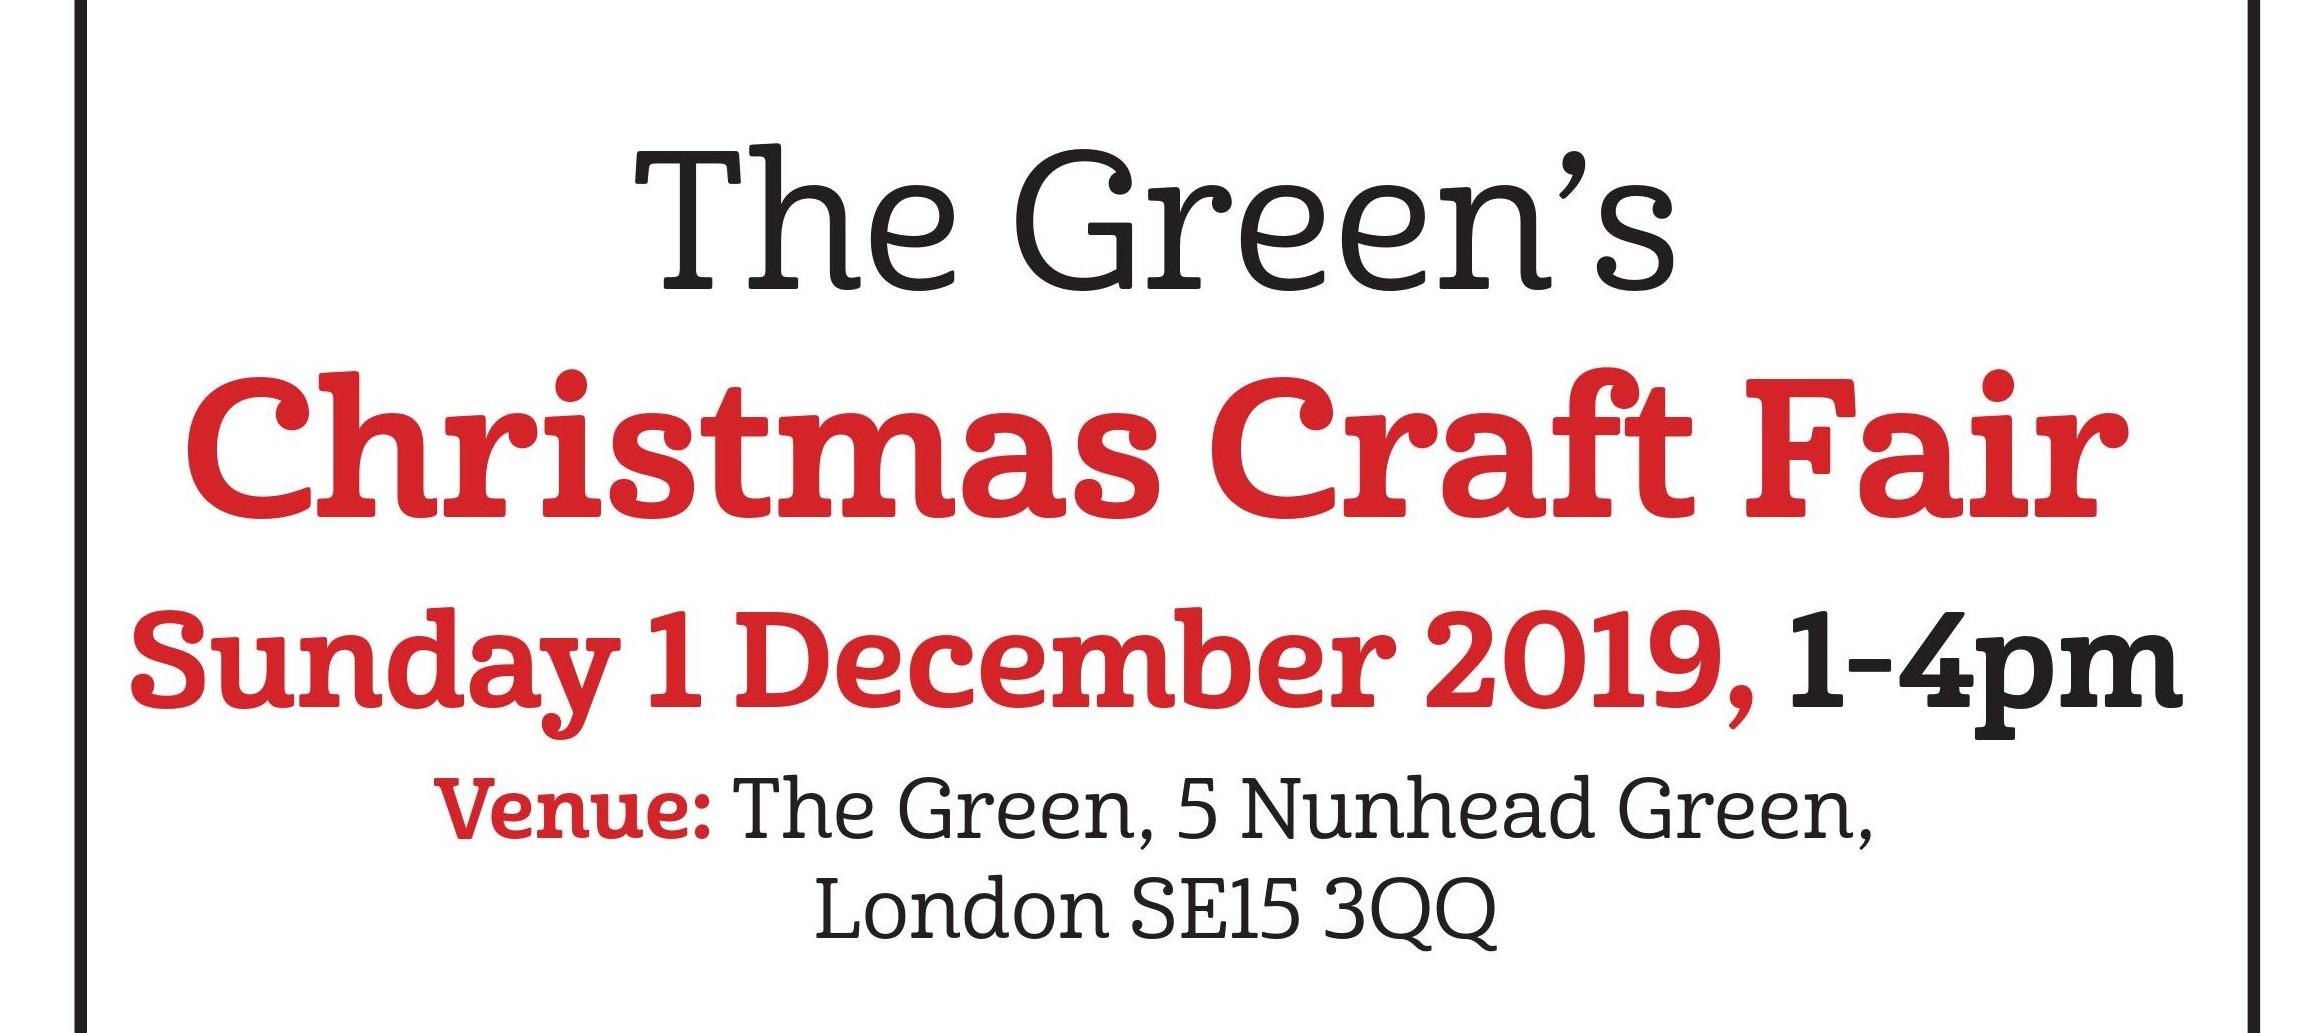 Christmas Craft Fair Event